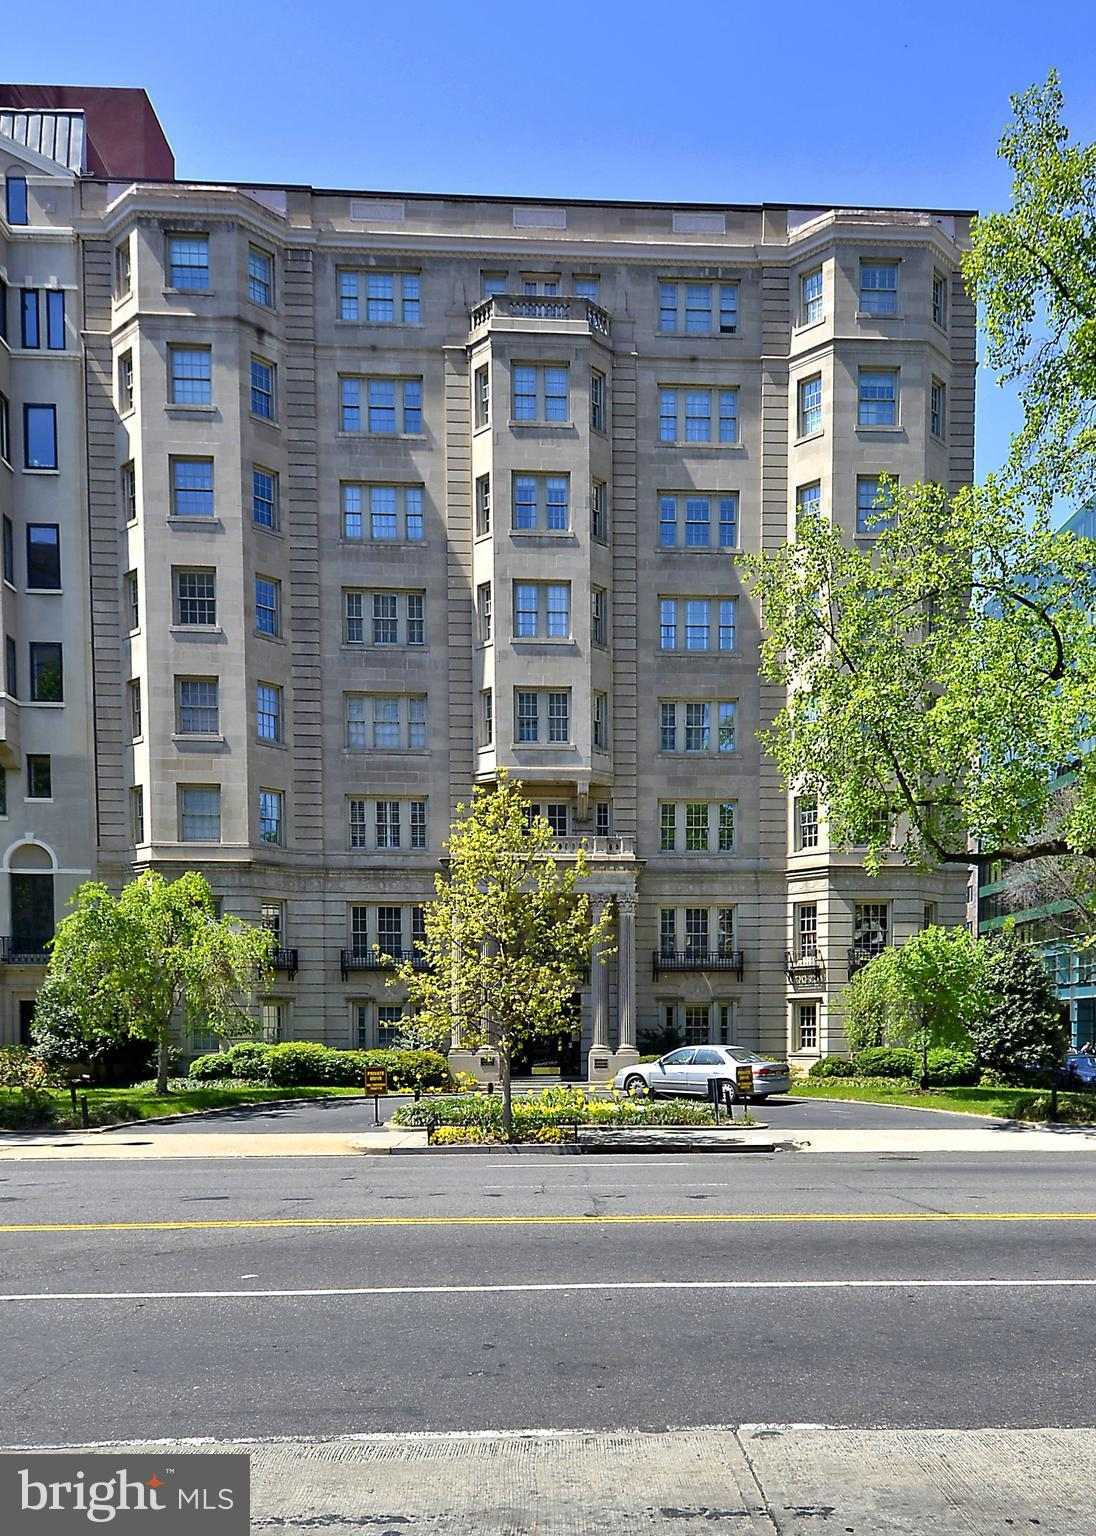 1026 16TH STREET NW 804-805-806, WASHINGTON, DC 20036